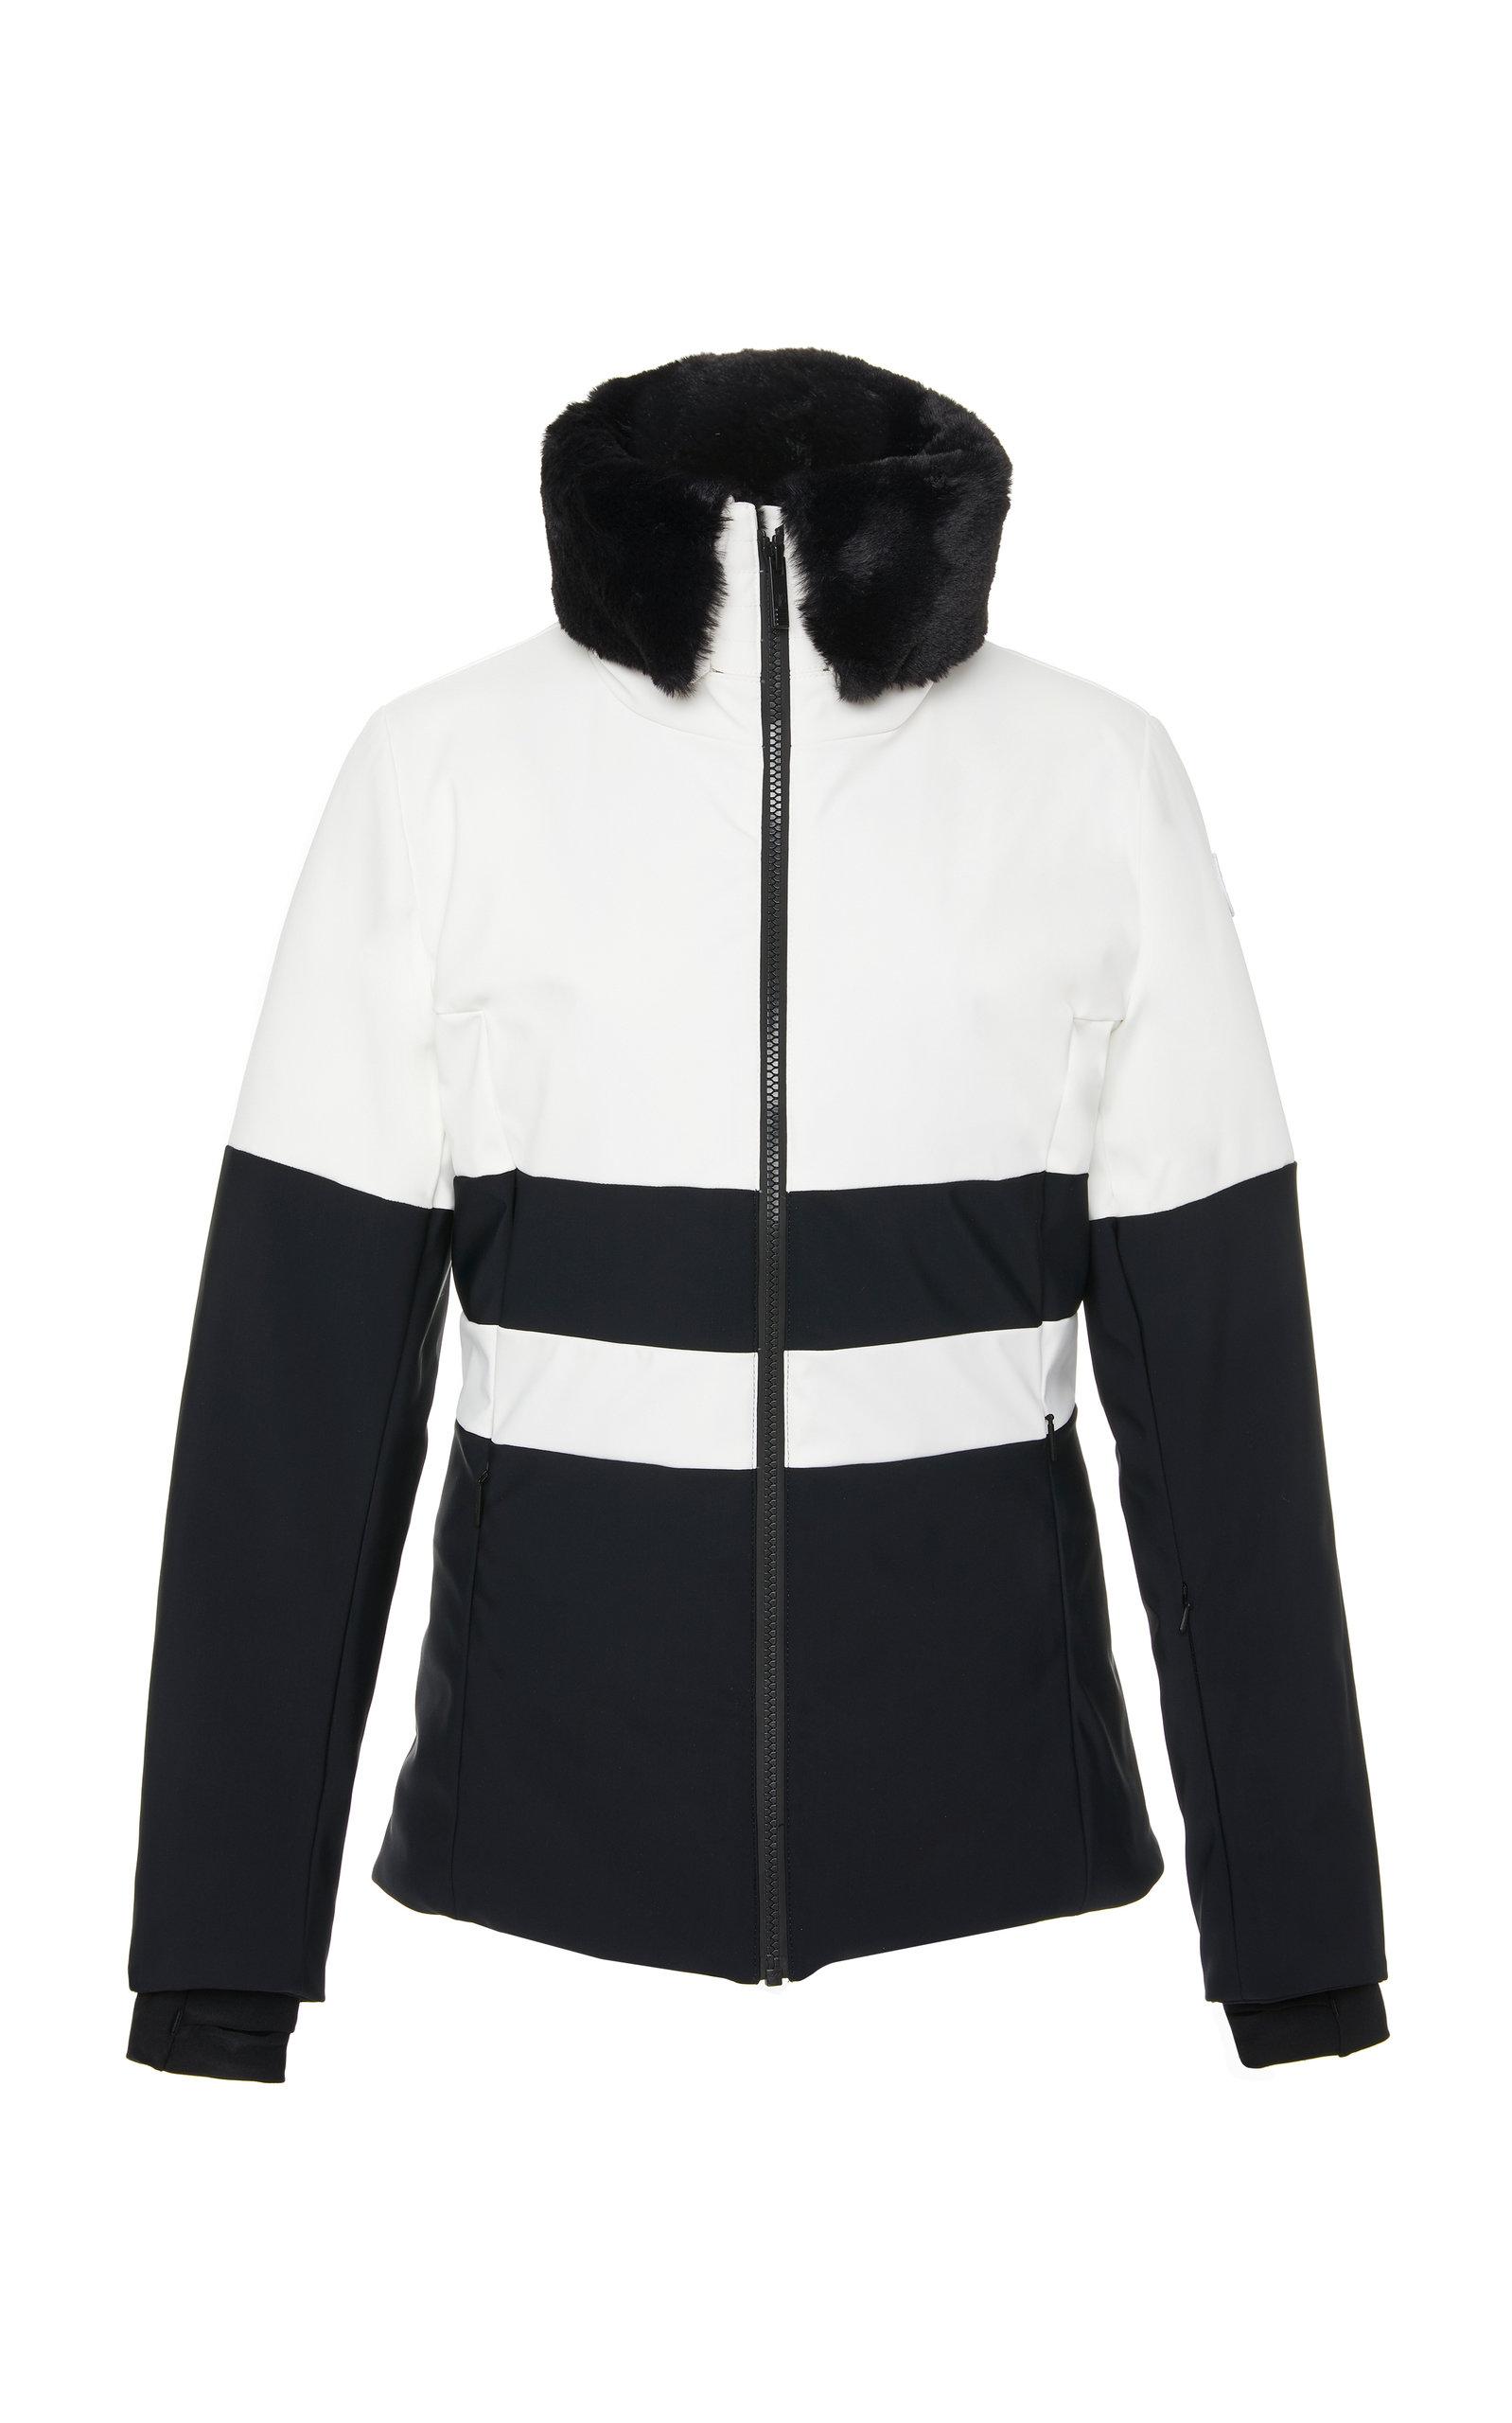 FUSALP Levanne Faux Fur-Trimmed Ski Jacket in Black